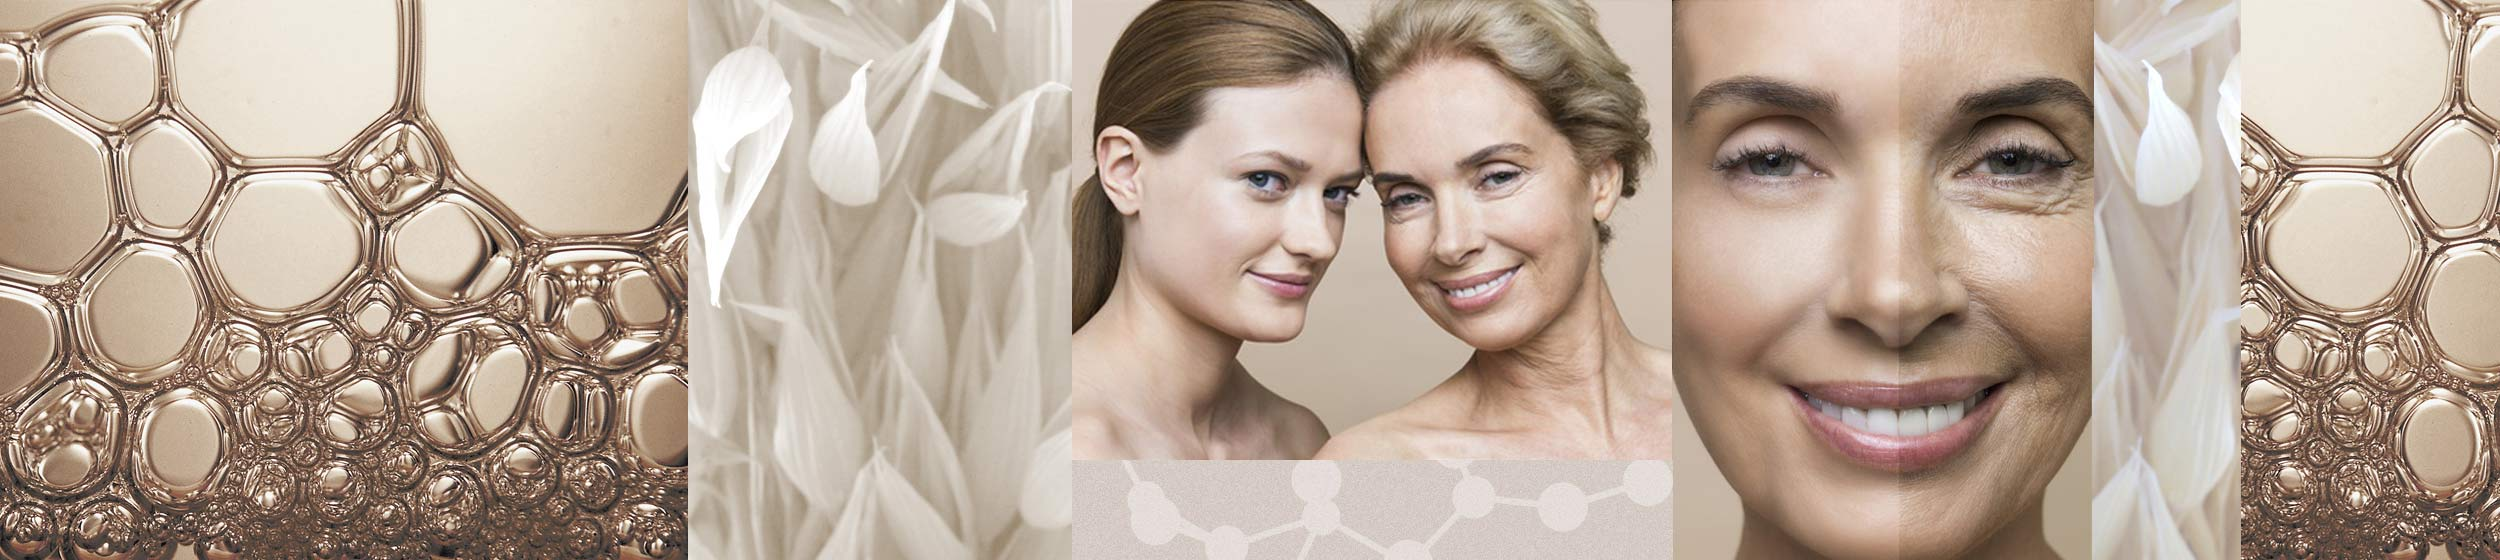 Hyperpigmented skin